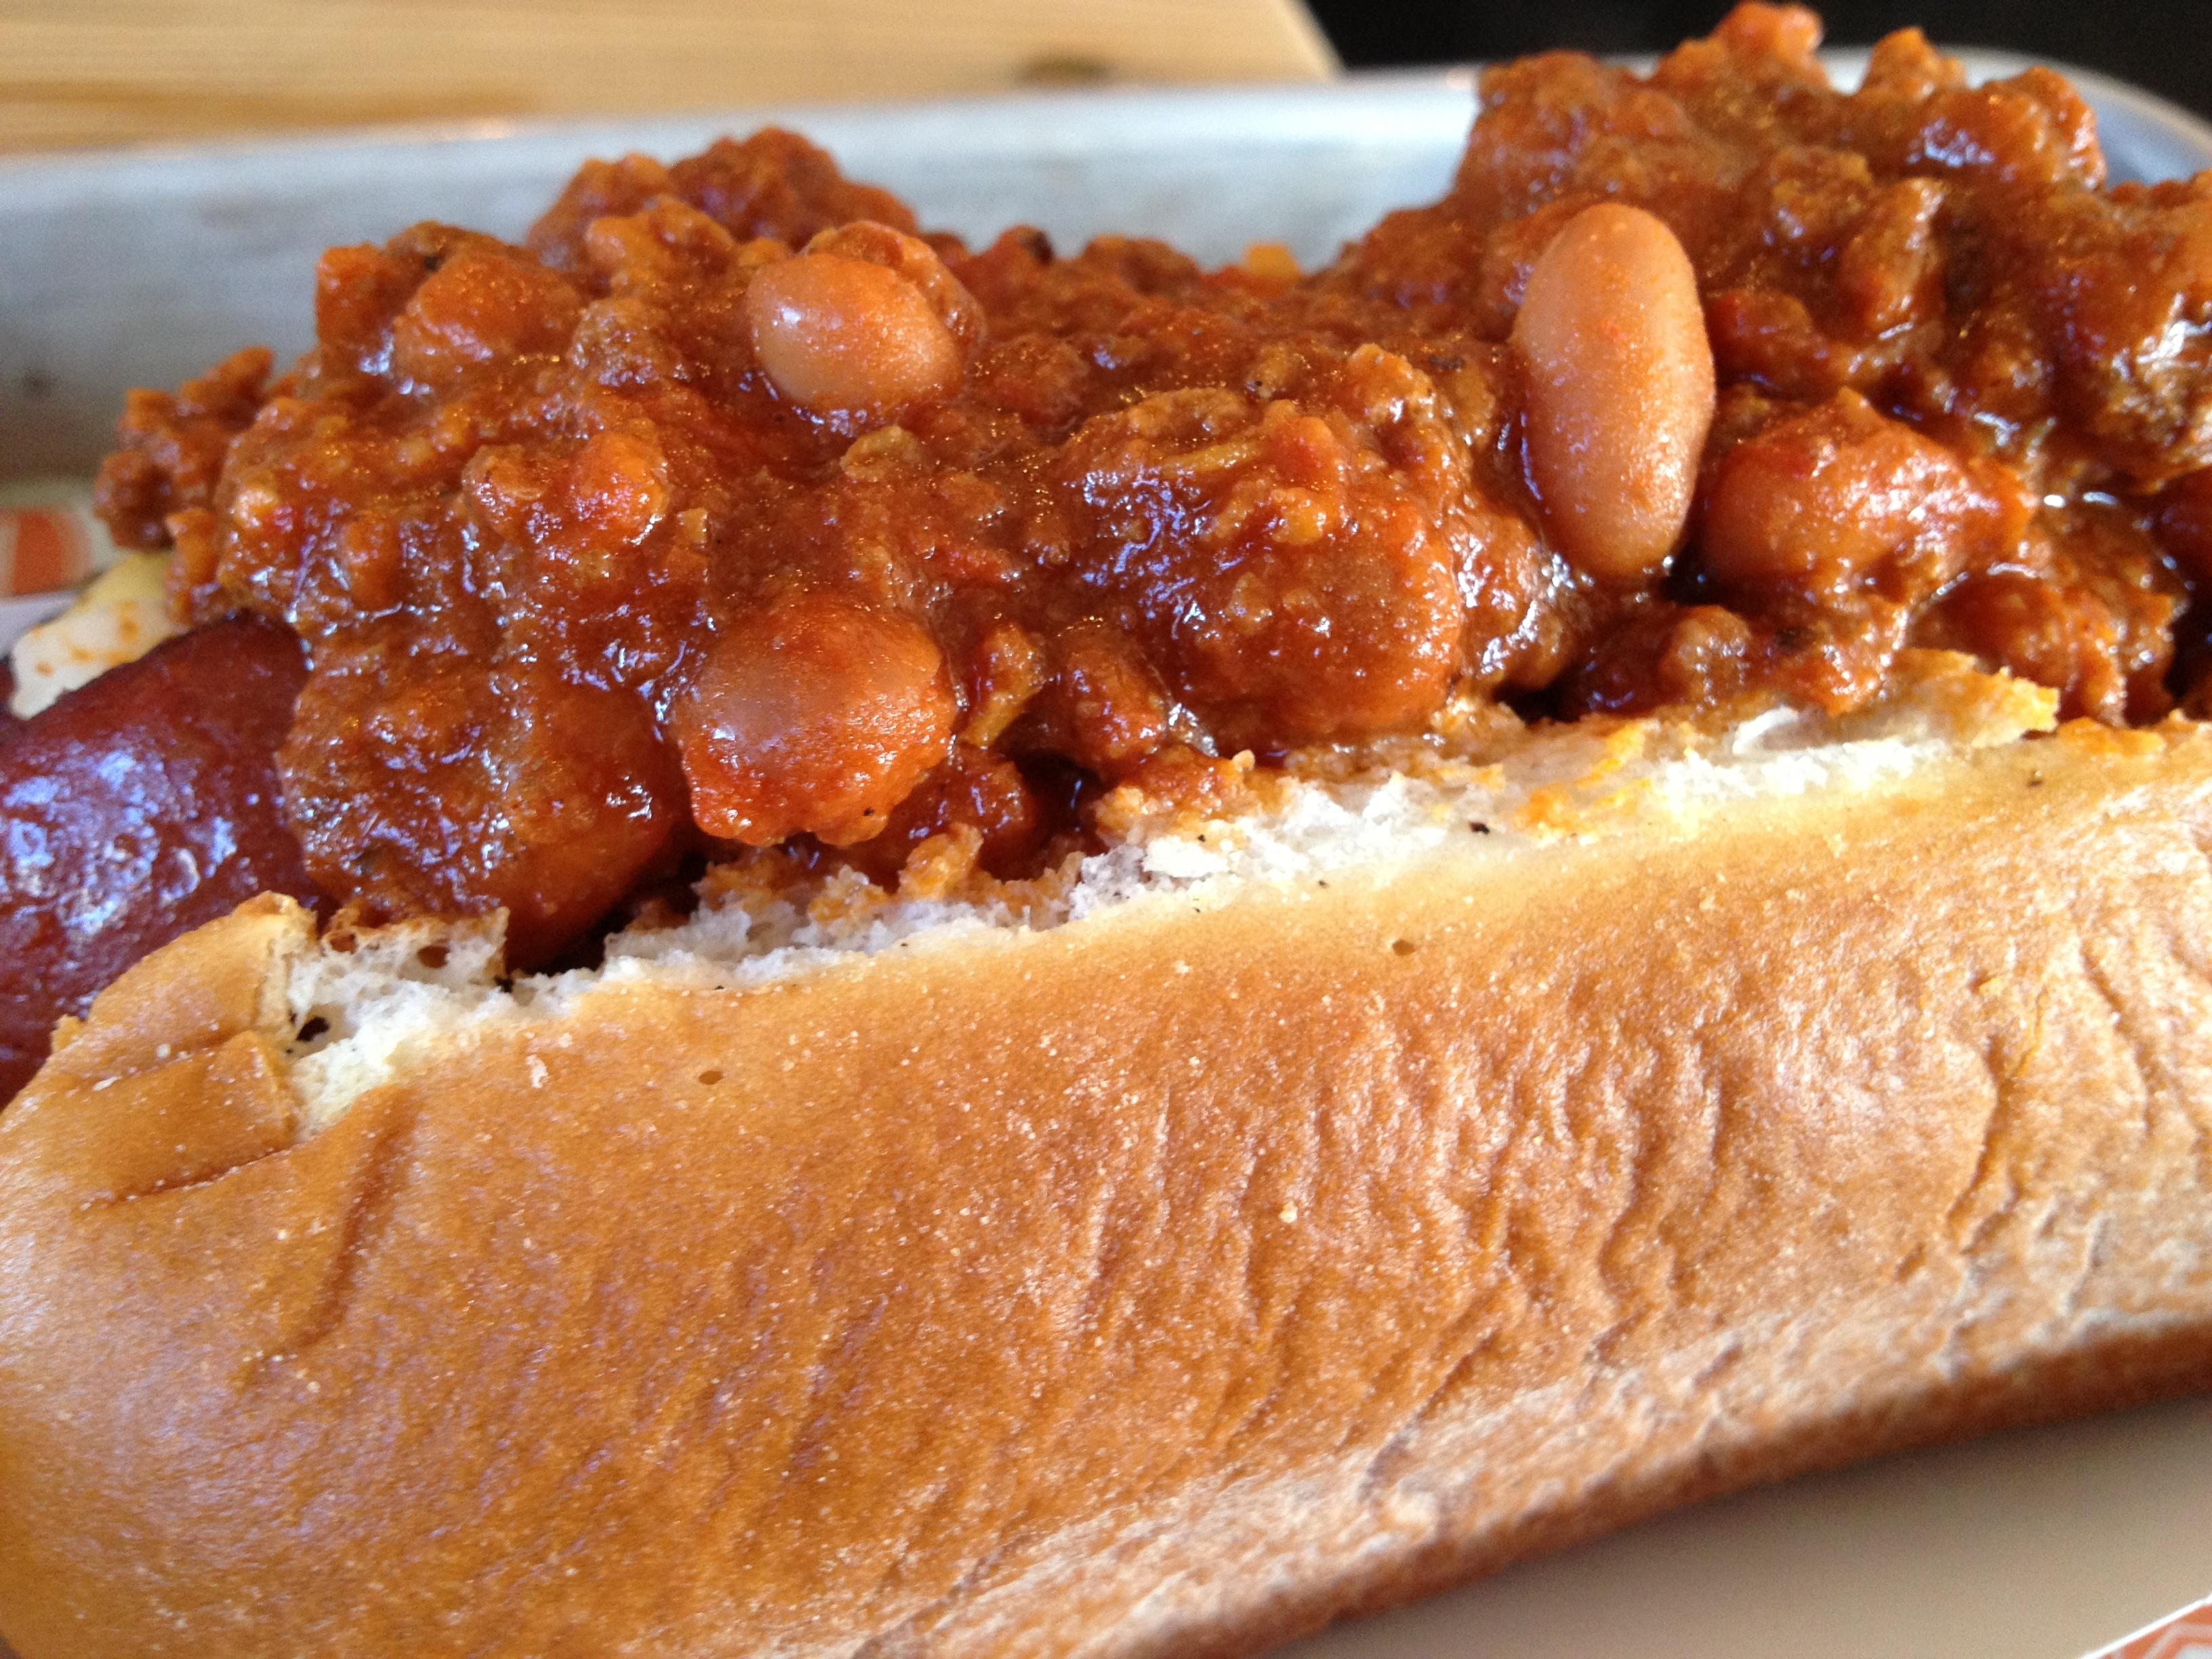 GF Hotdog